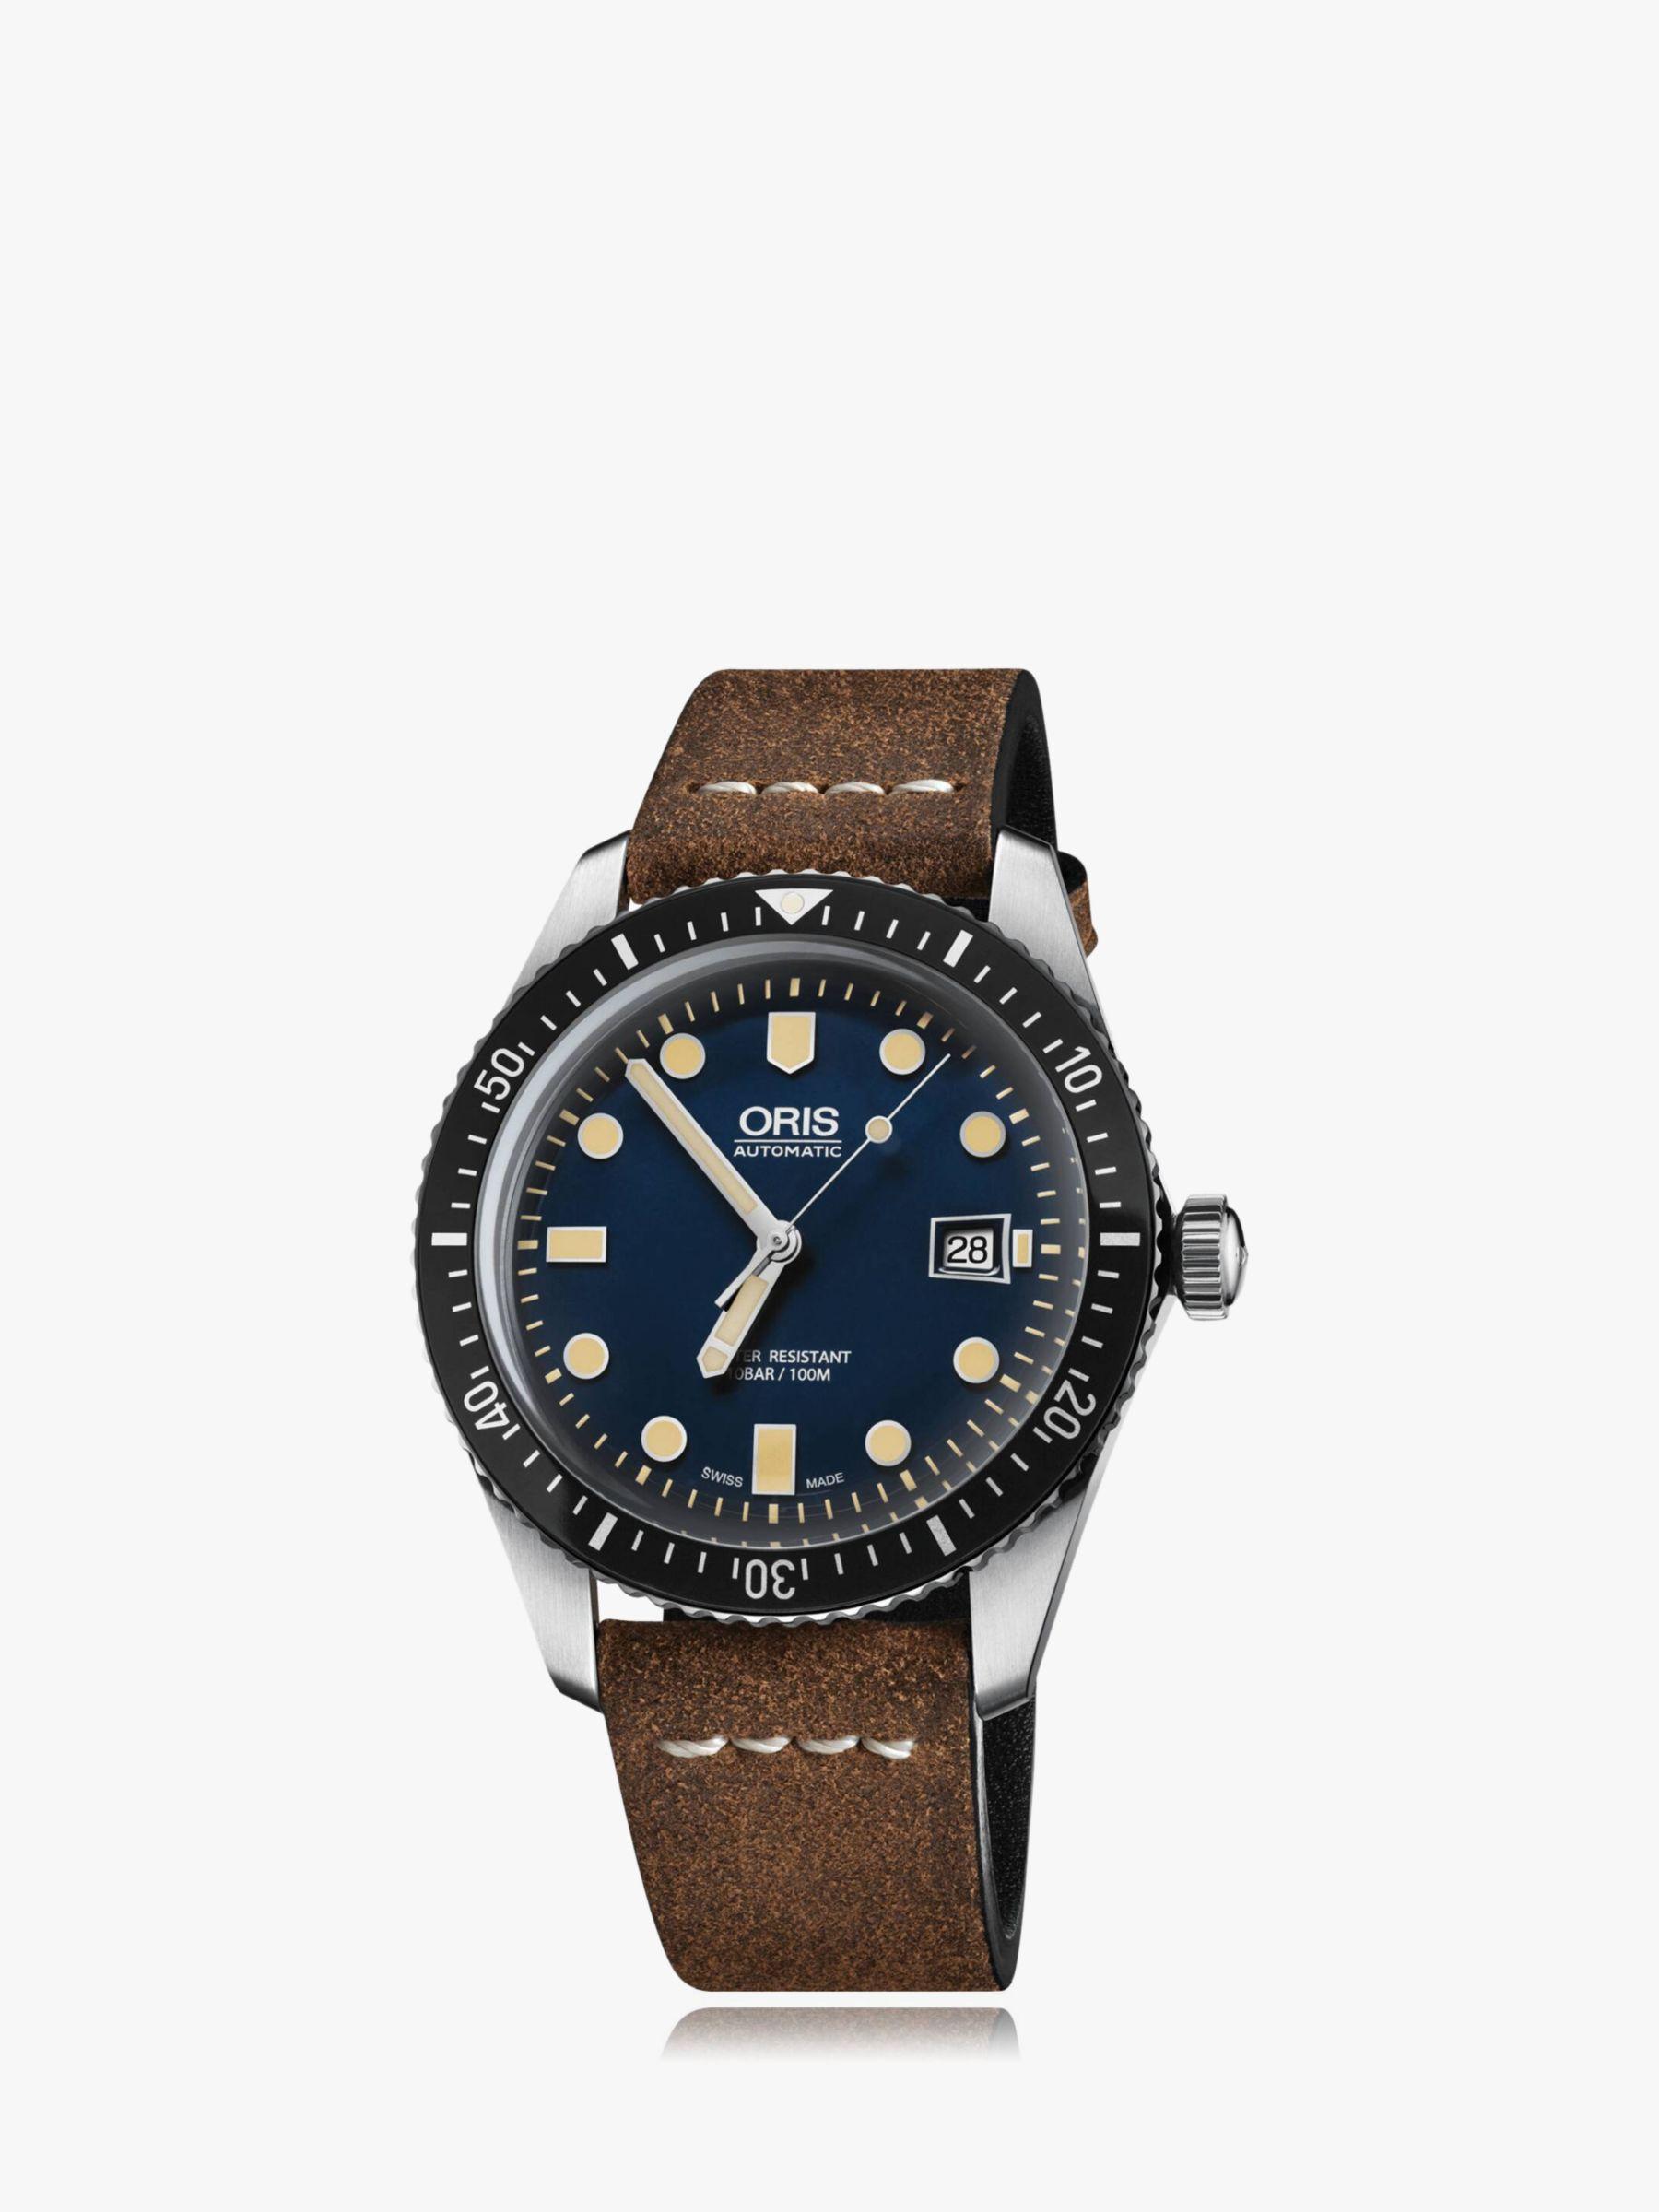 Oris Oris 733 7720 4055-07 5 21 02 Men's Artelier Automatic Date Leather Strap Watch, Brown/Navy